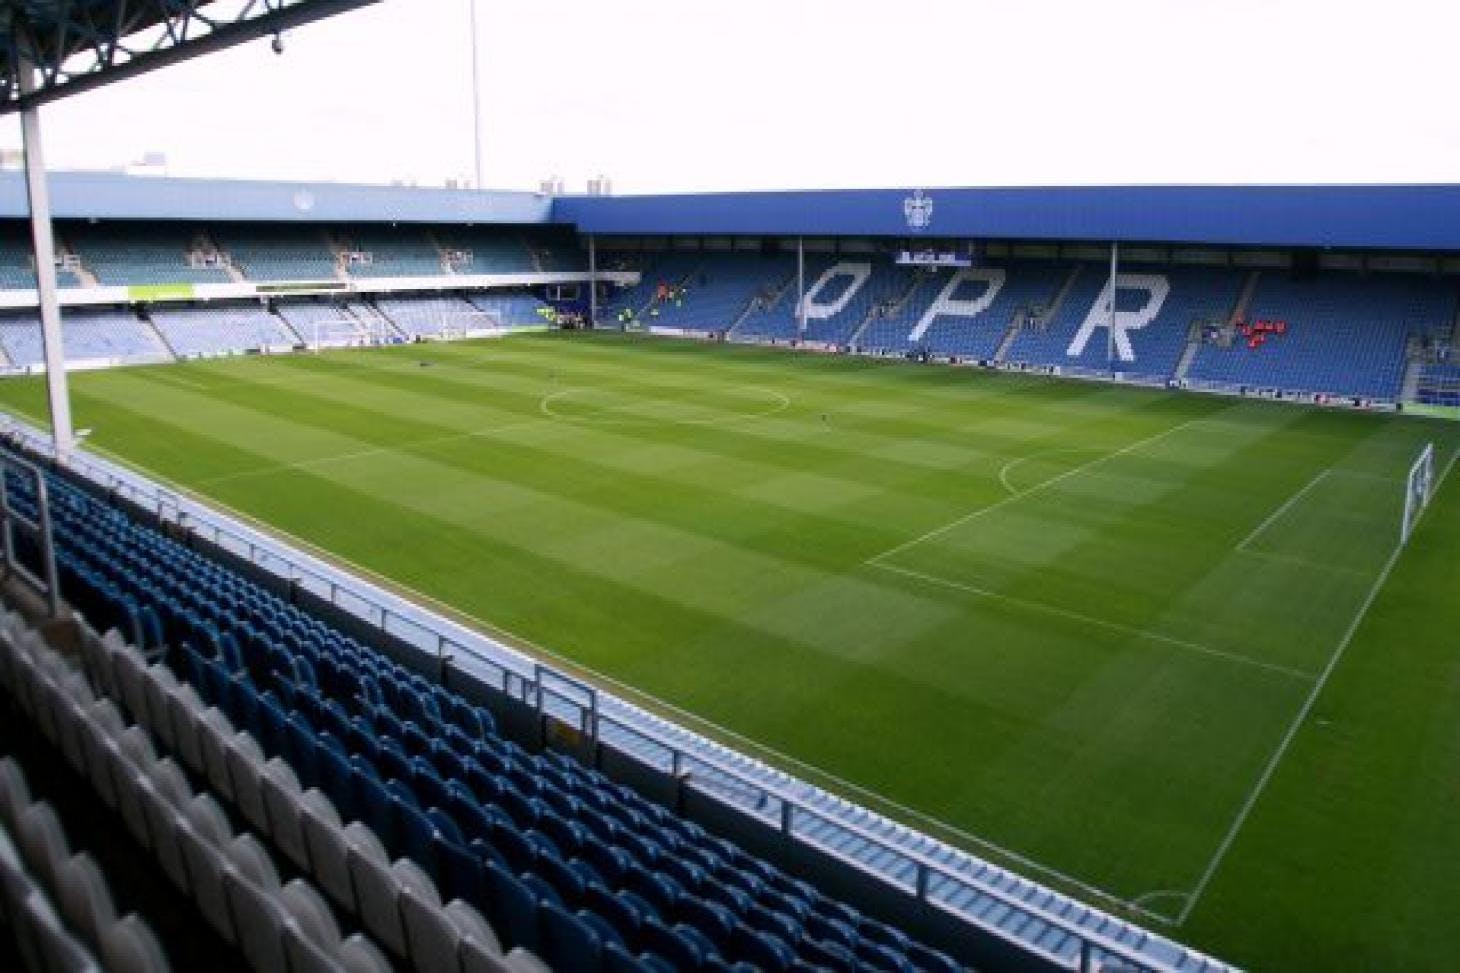 Loftus Road Stadium 11 a side | Grass football pitch